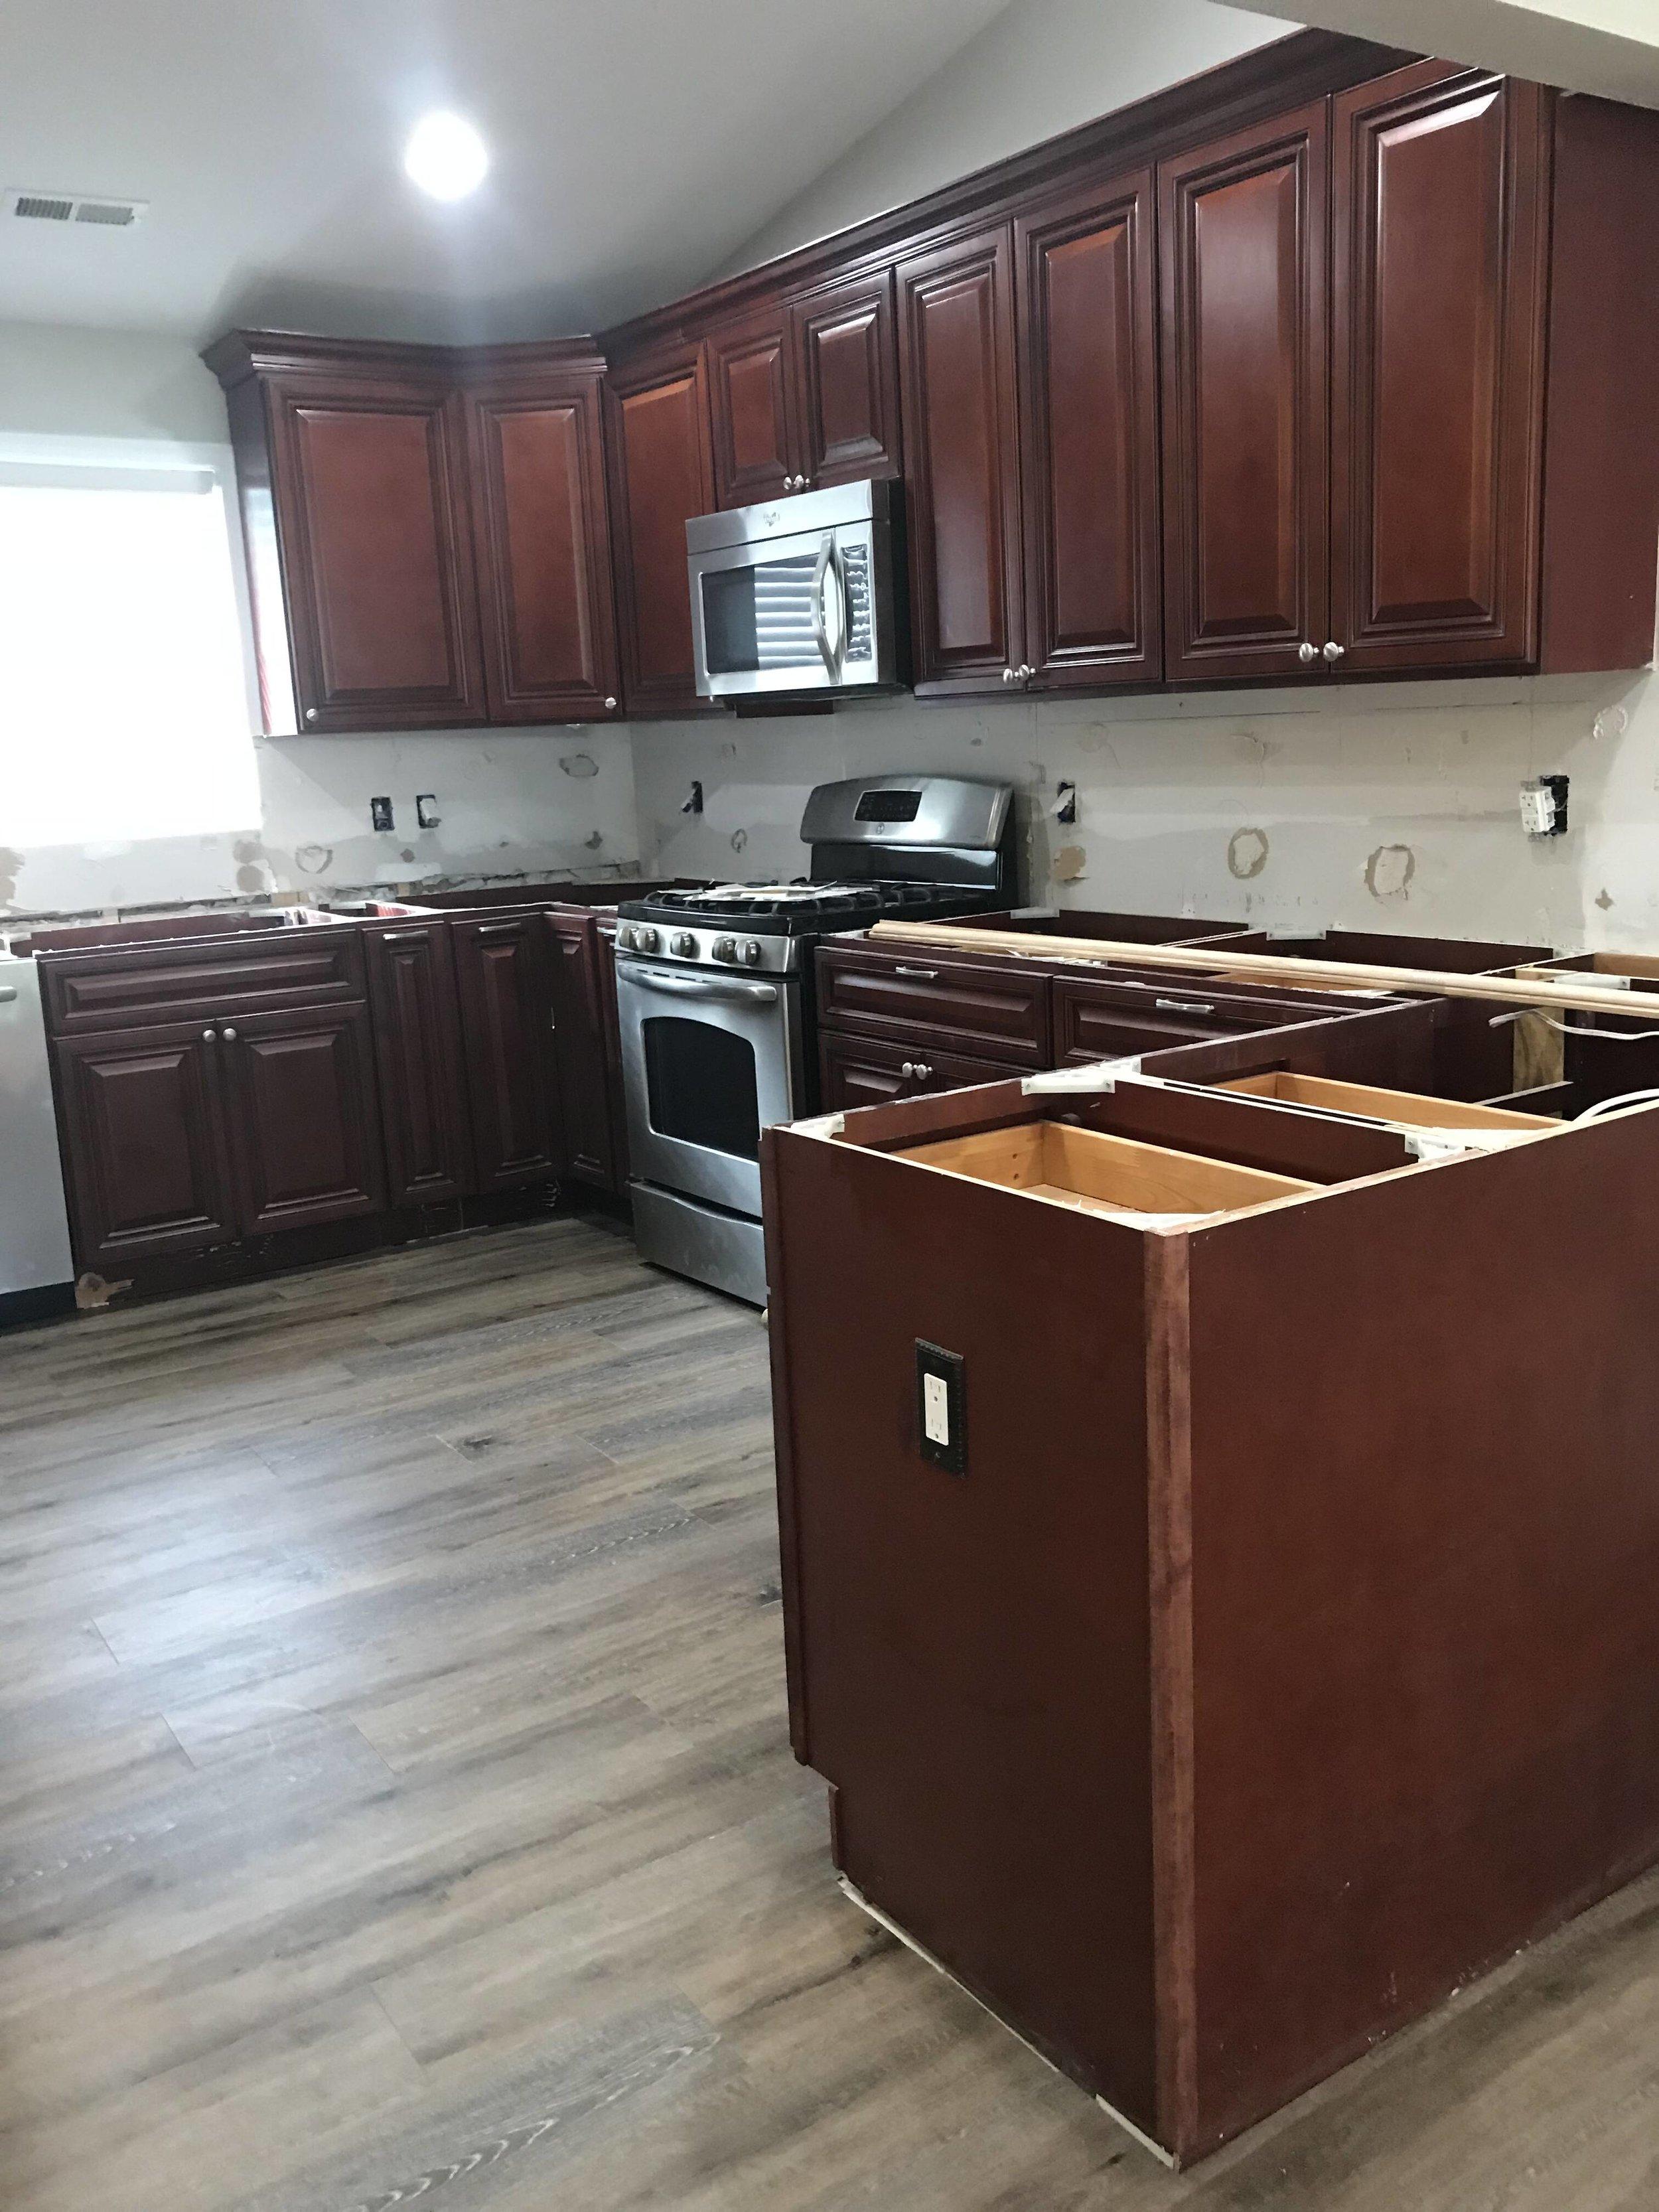 Backsplash, c-top removed and new floor installed